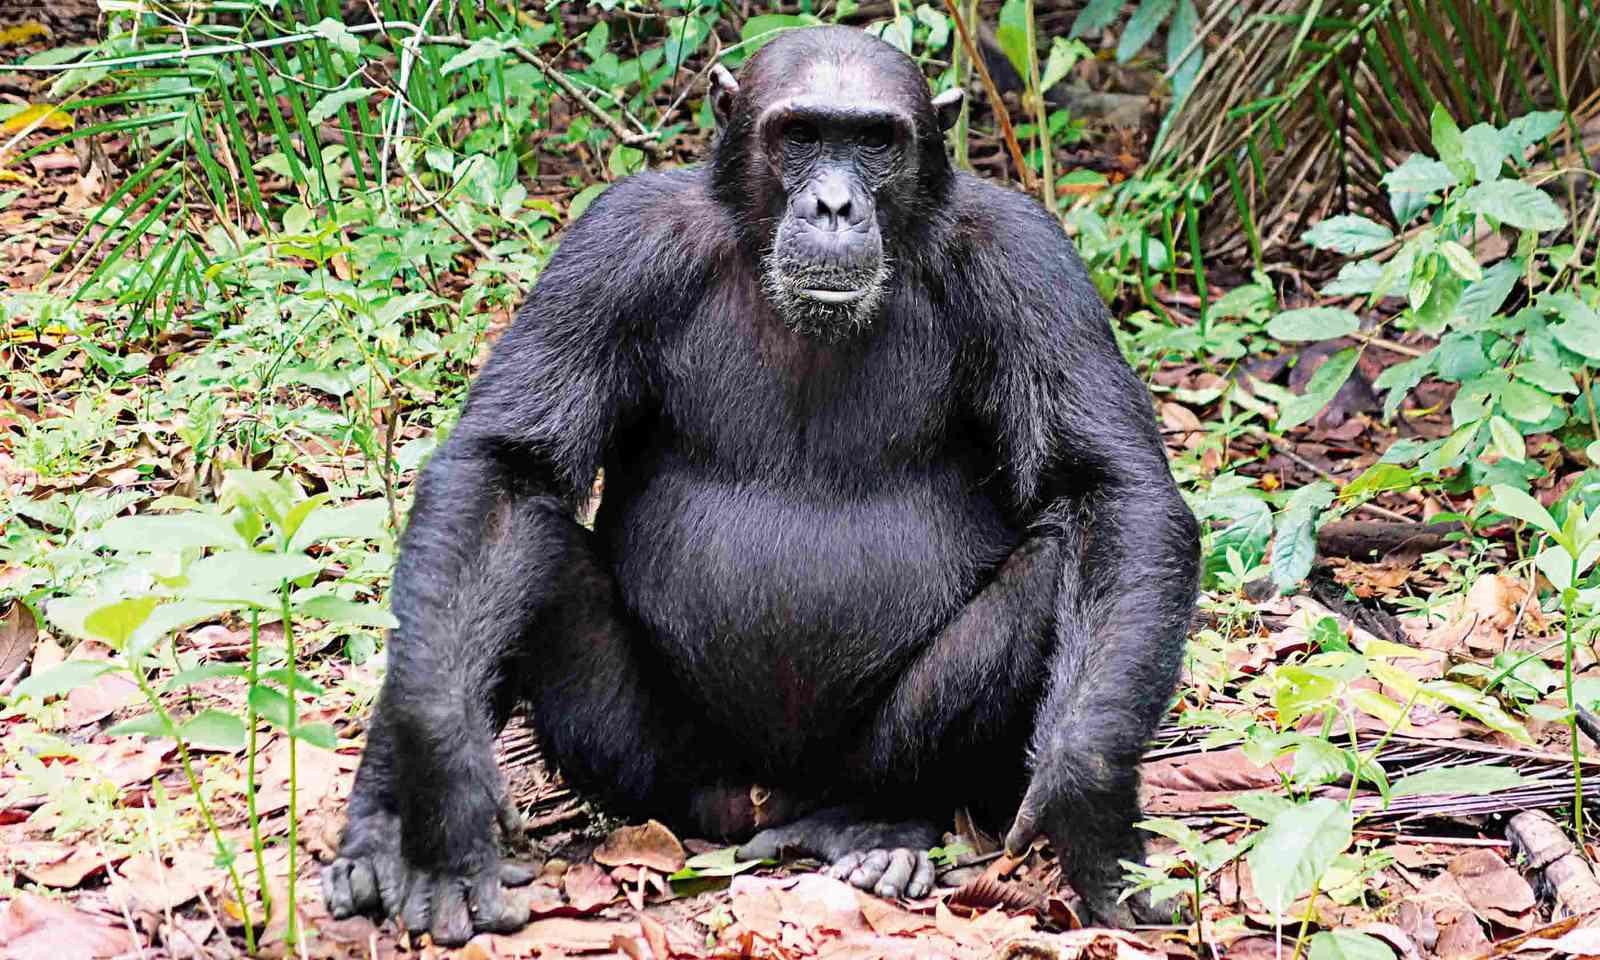 Chimp known as Christmas poses for the cameras (Sarah Gilbert)